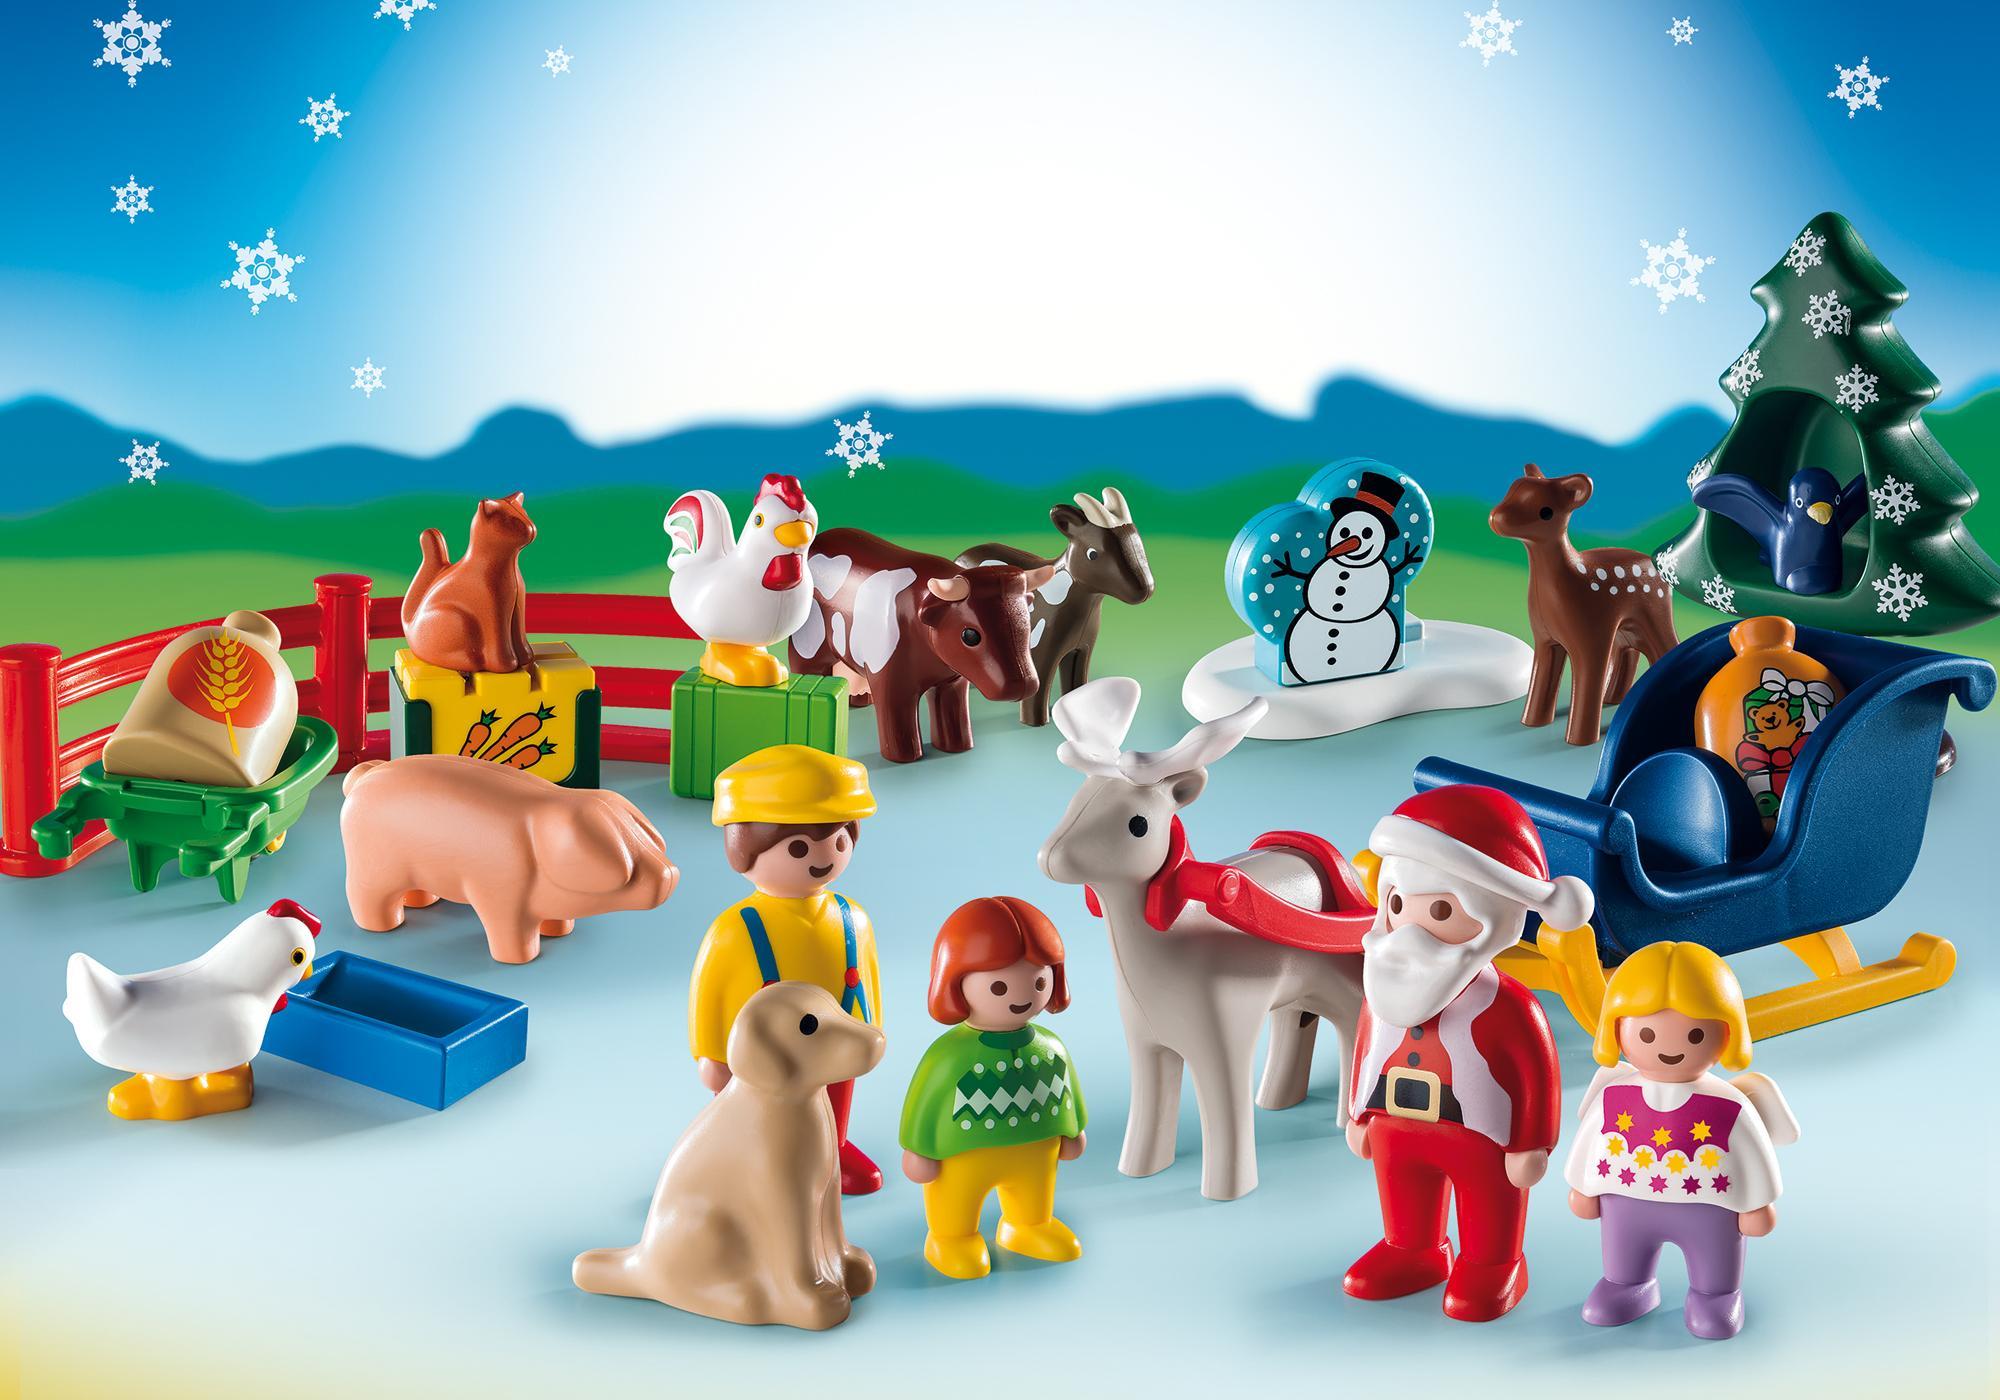 http://media.playmobil.com/i/playmobil/9009_product_extra1/1.2.3 Advent Calendar Christmas on the Farm